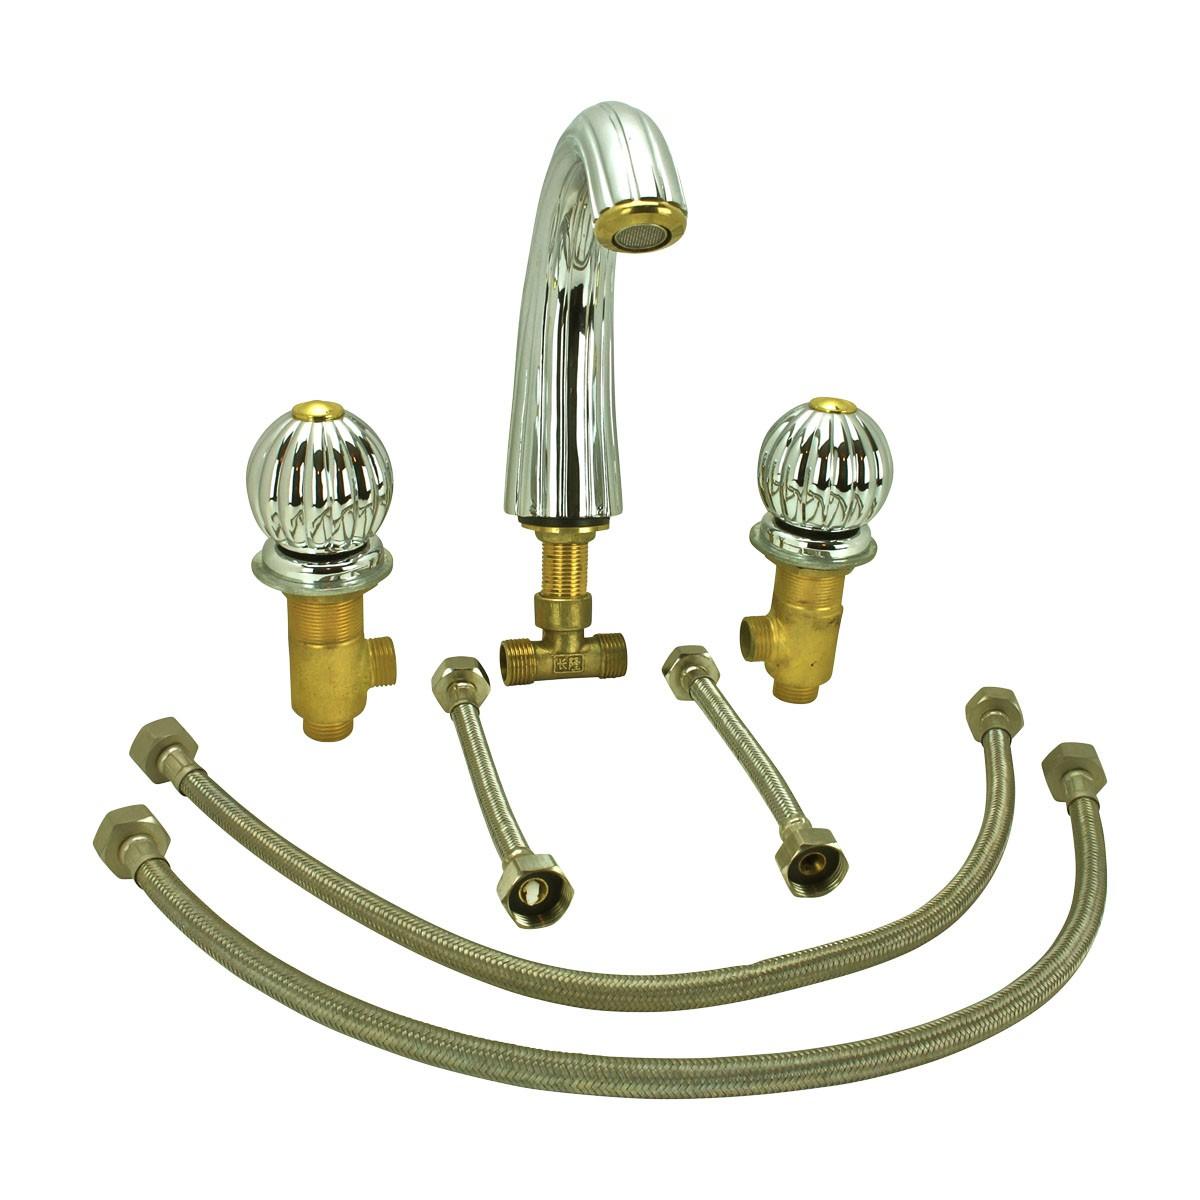 Bathroom Shell Faucet Chrome Widespread Dual Ball 2 Handles Widespread Faucets Wide spread Faucets Bathroom 8 Sink Faucet